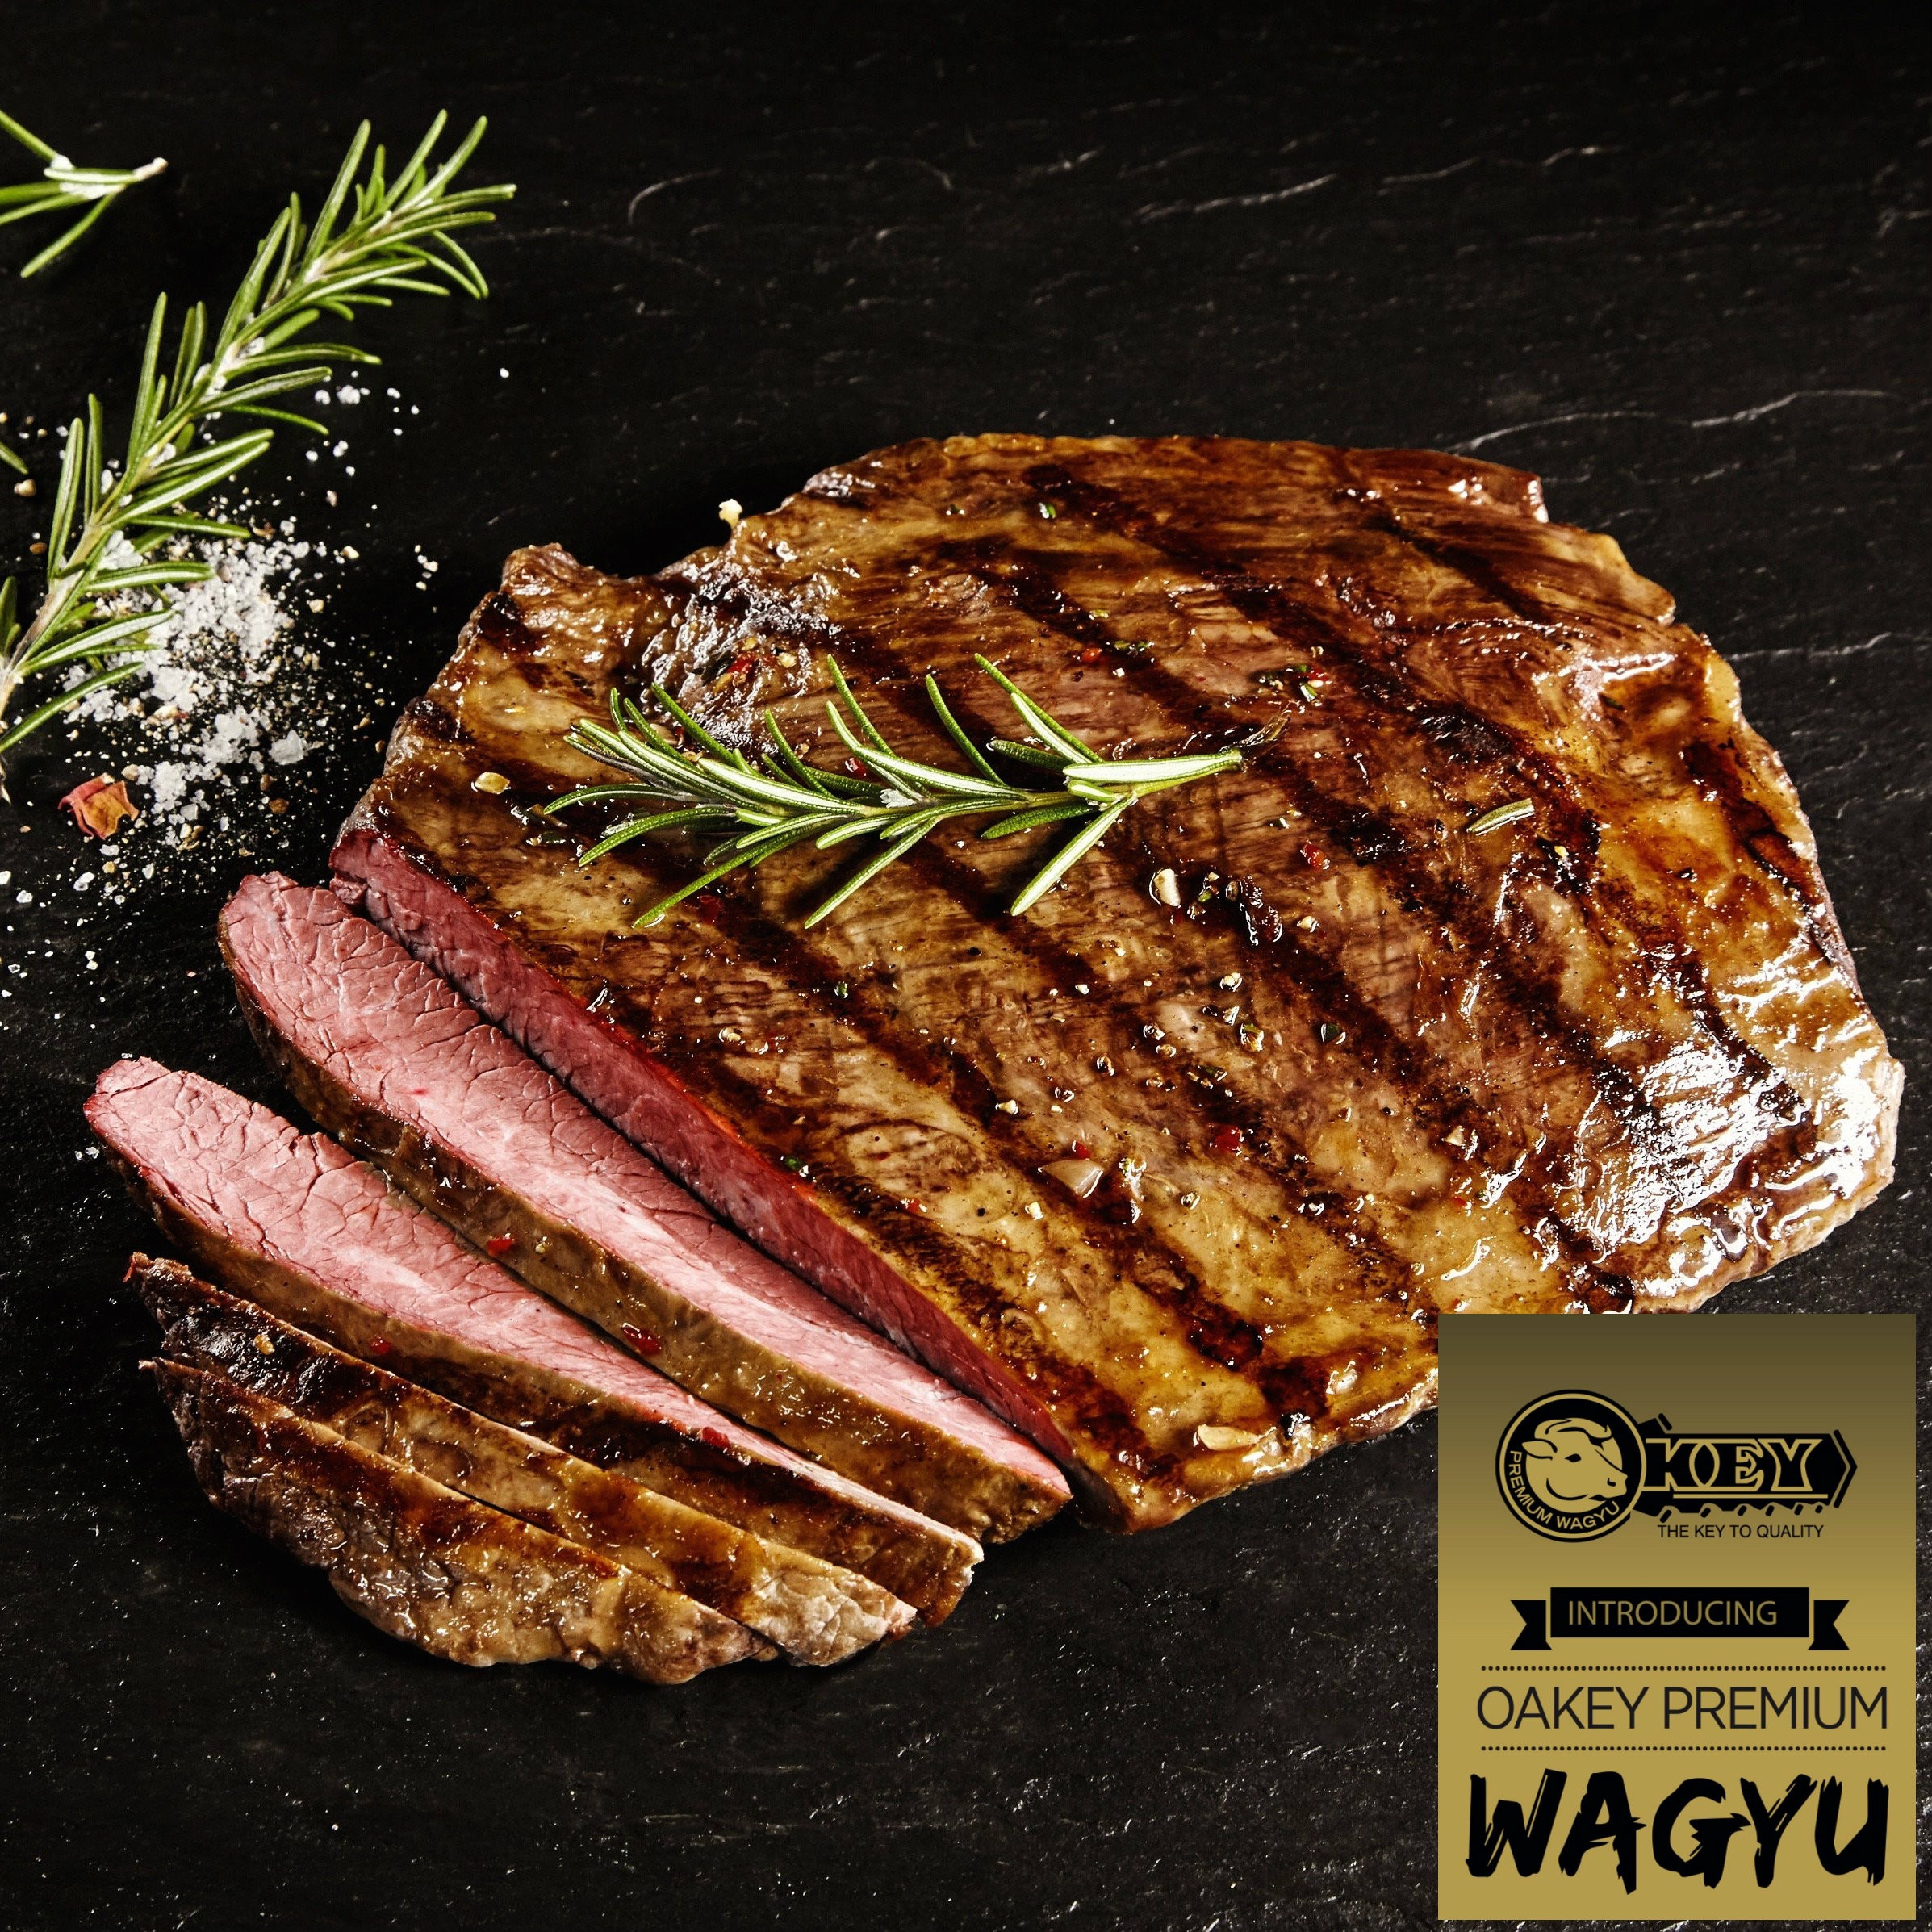 Flank. Oakey Premium Wagyu. Mbs 3-5